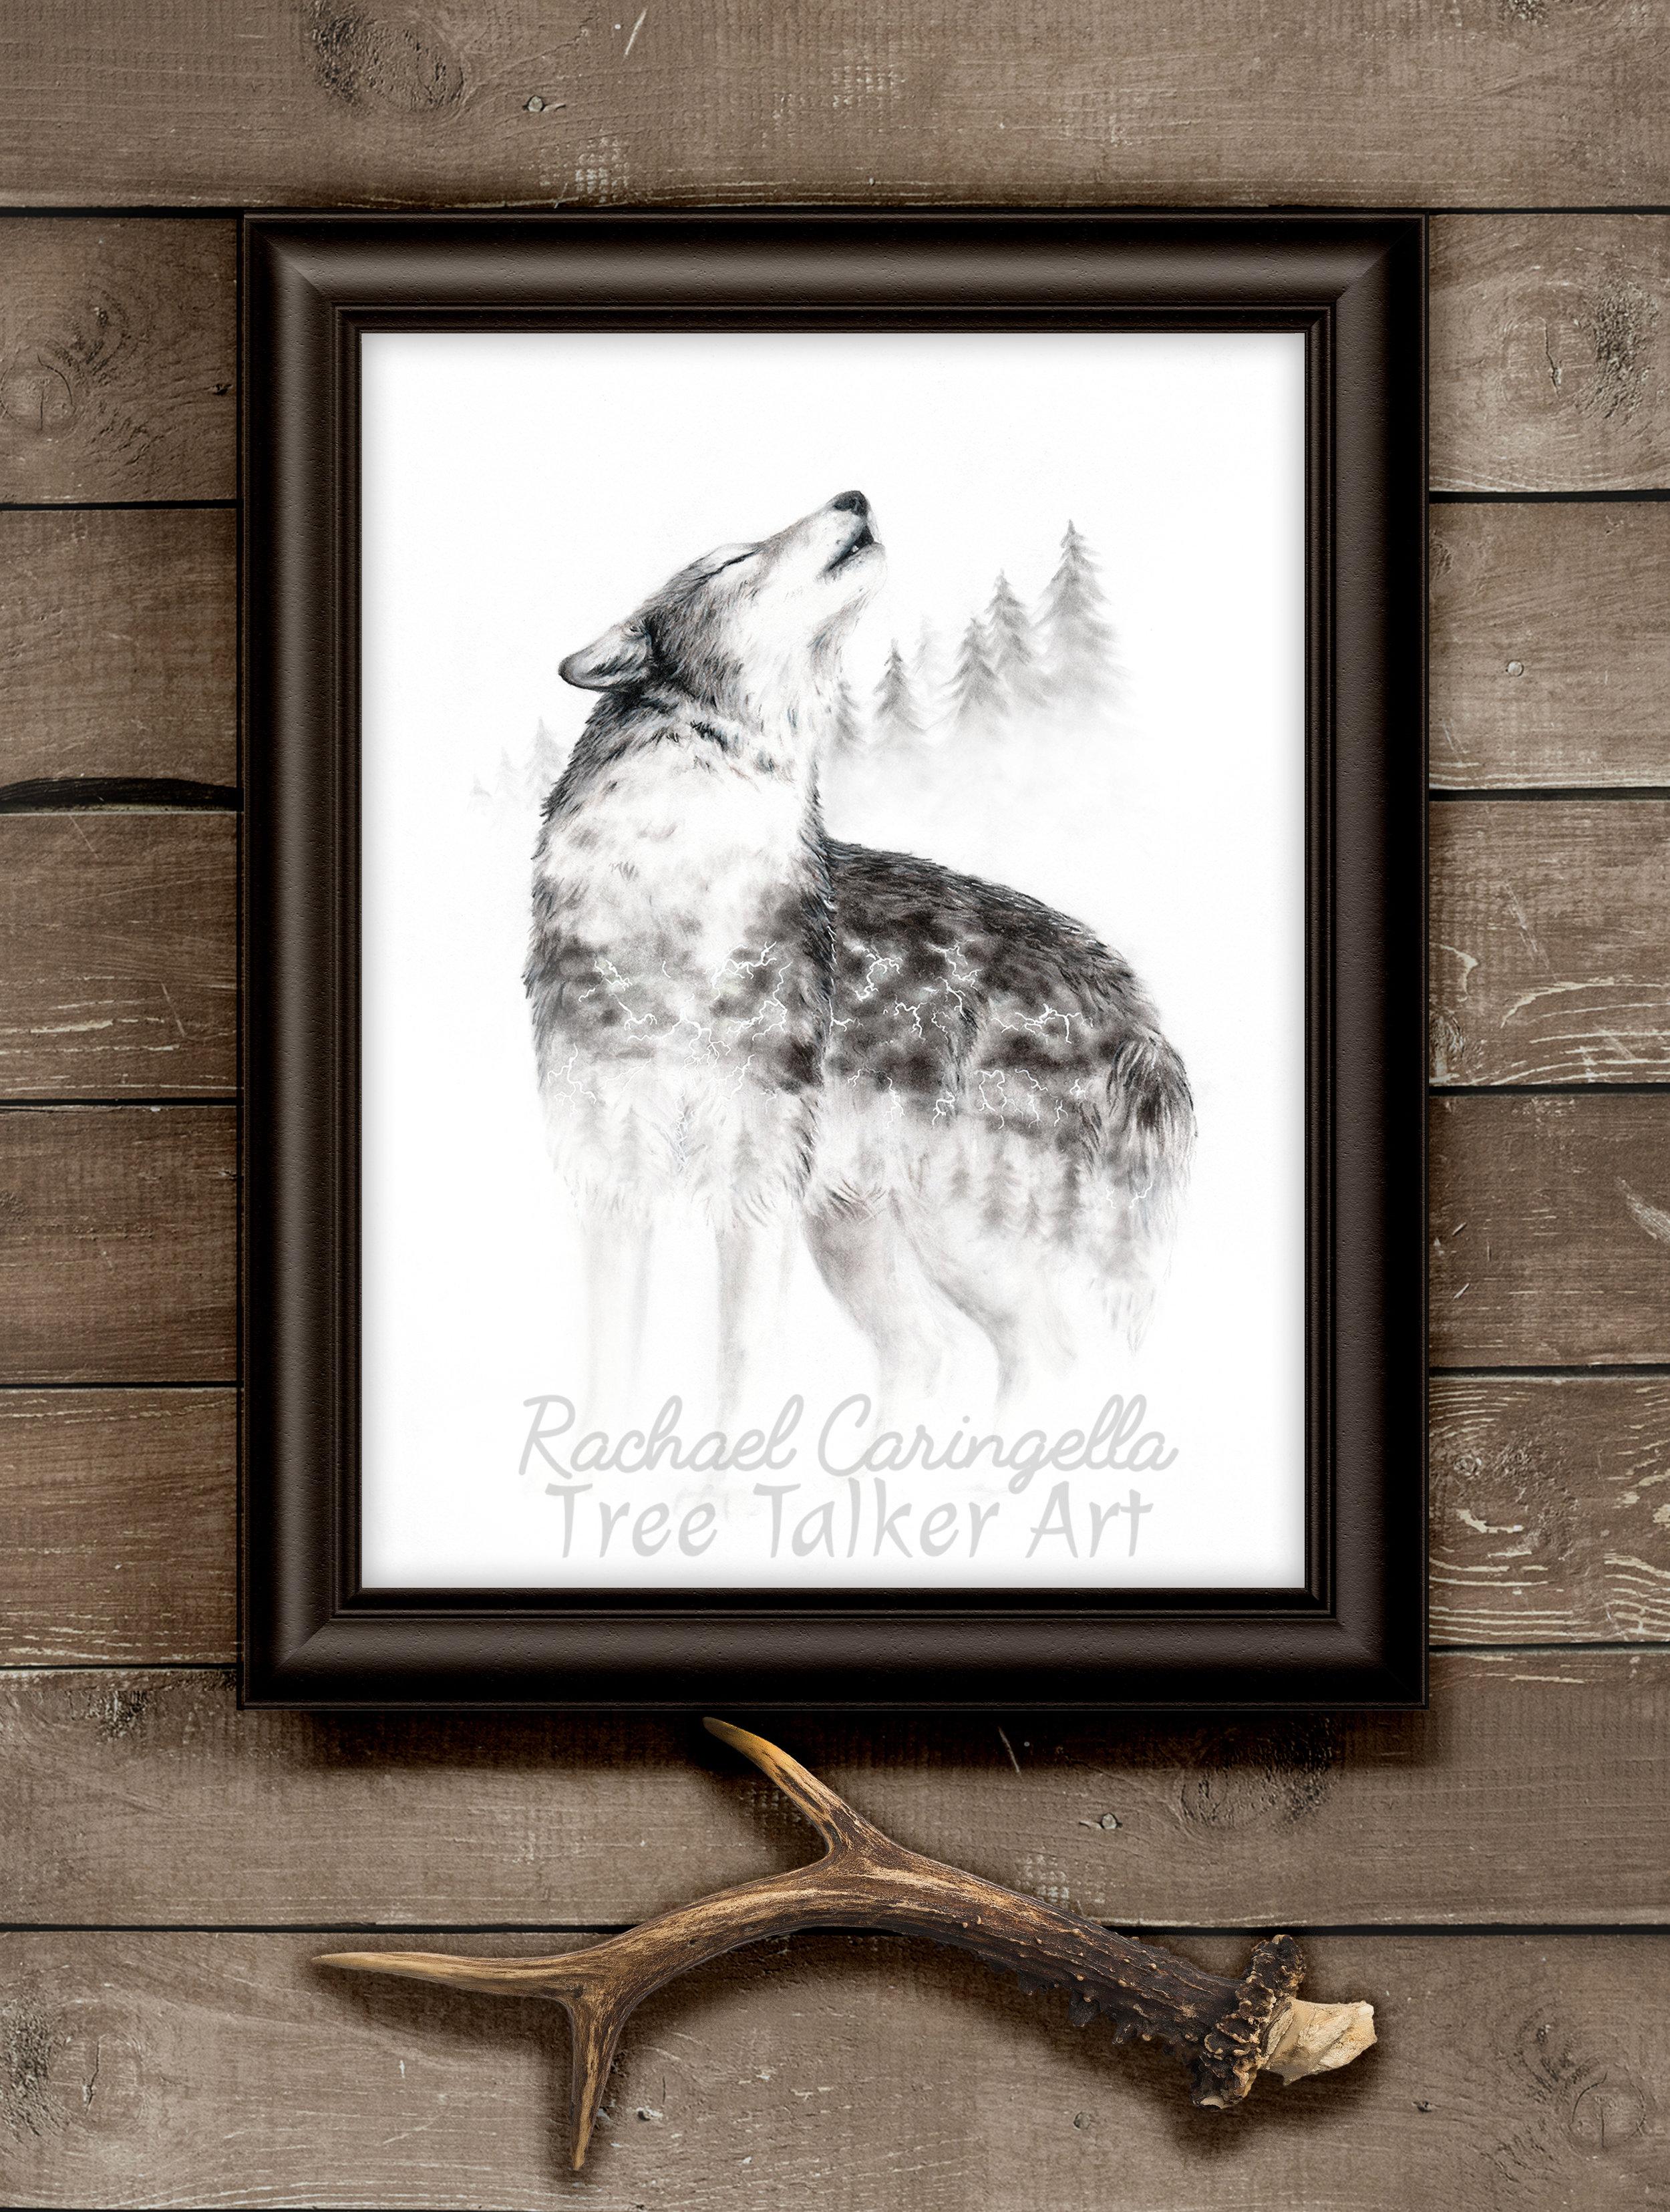 """Mourning Song"" Wolf Howling Art | Rachael Caringella Tree Talker Art"